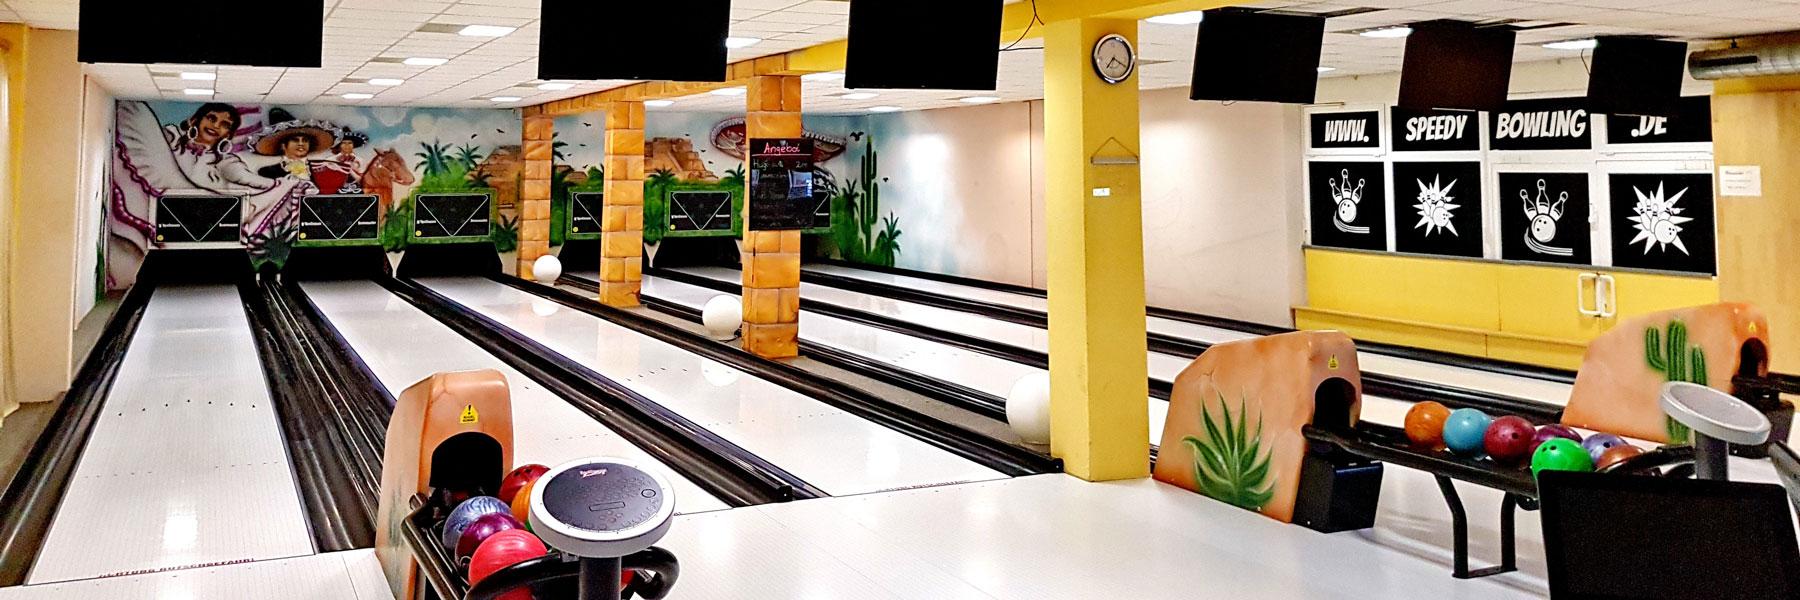 Bowlingbahn - Müritz-Pension